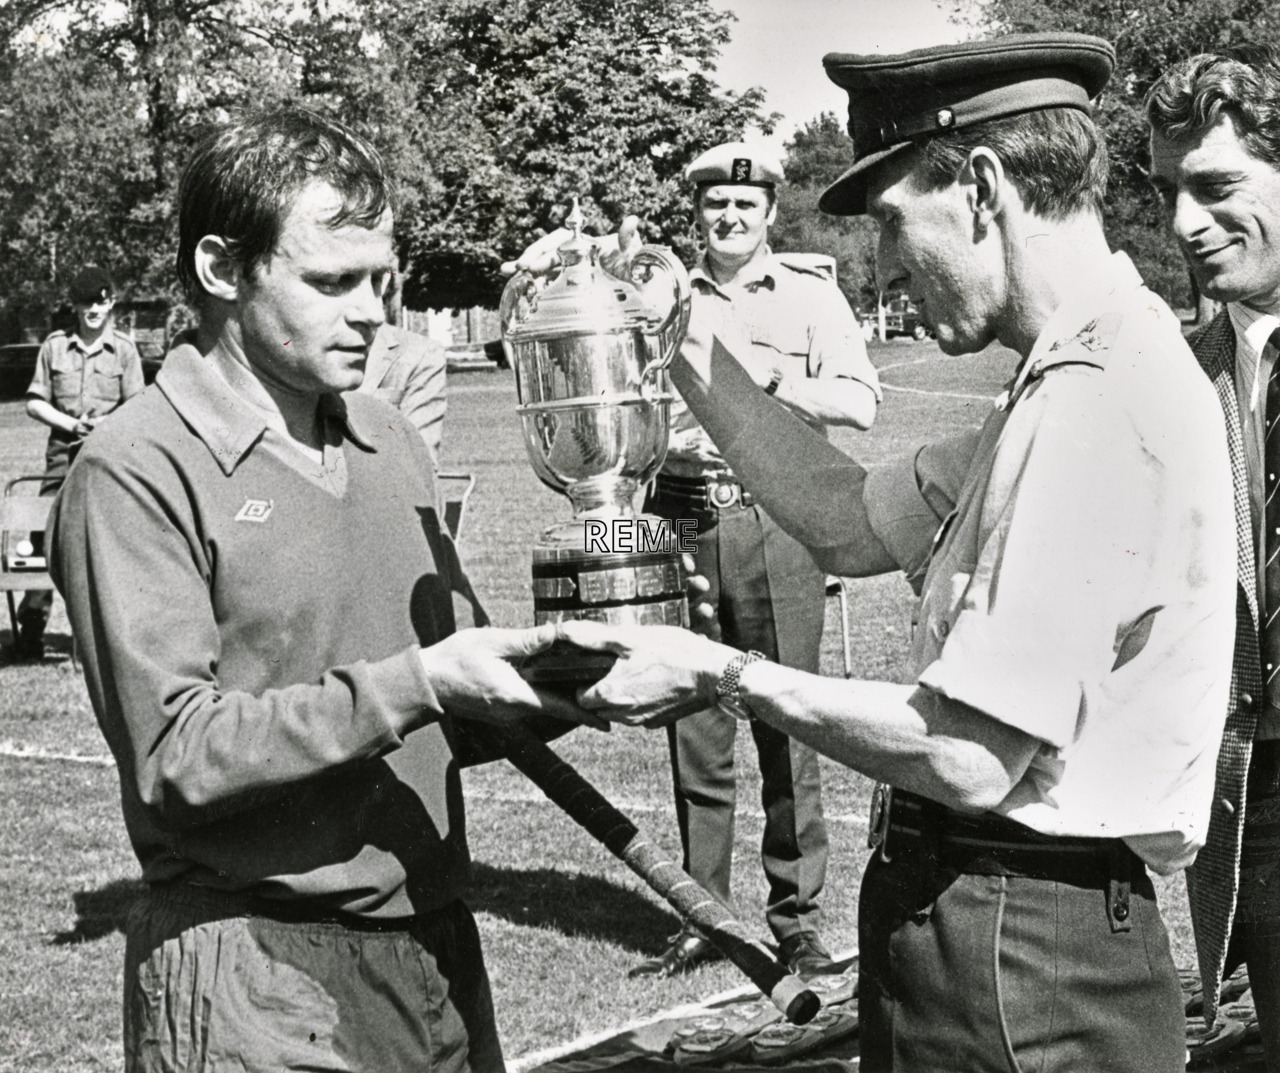 Presentation of the Ian Marshall Hockey Trophy to REME Bielefeld, 1978